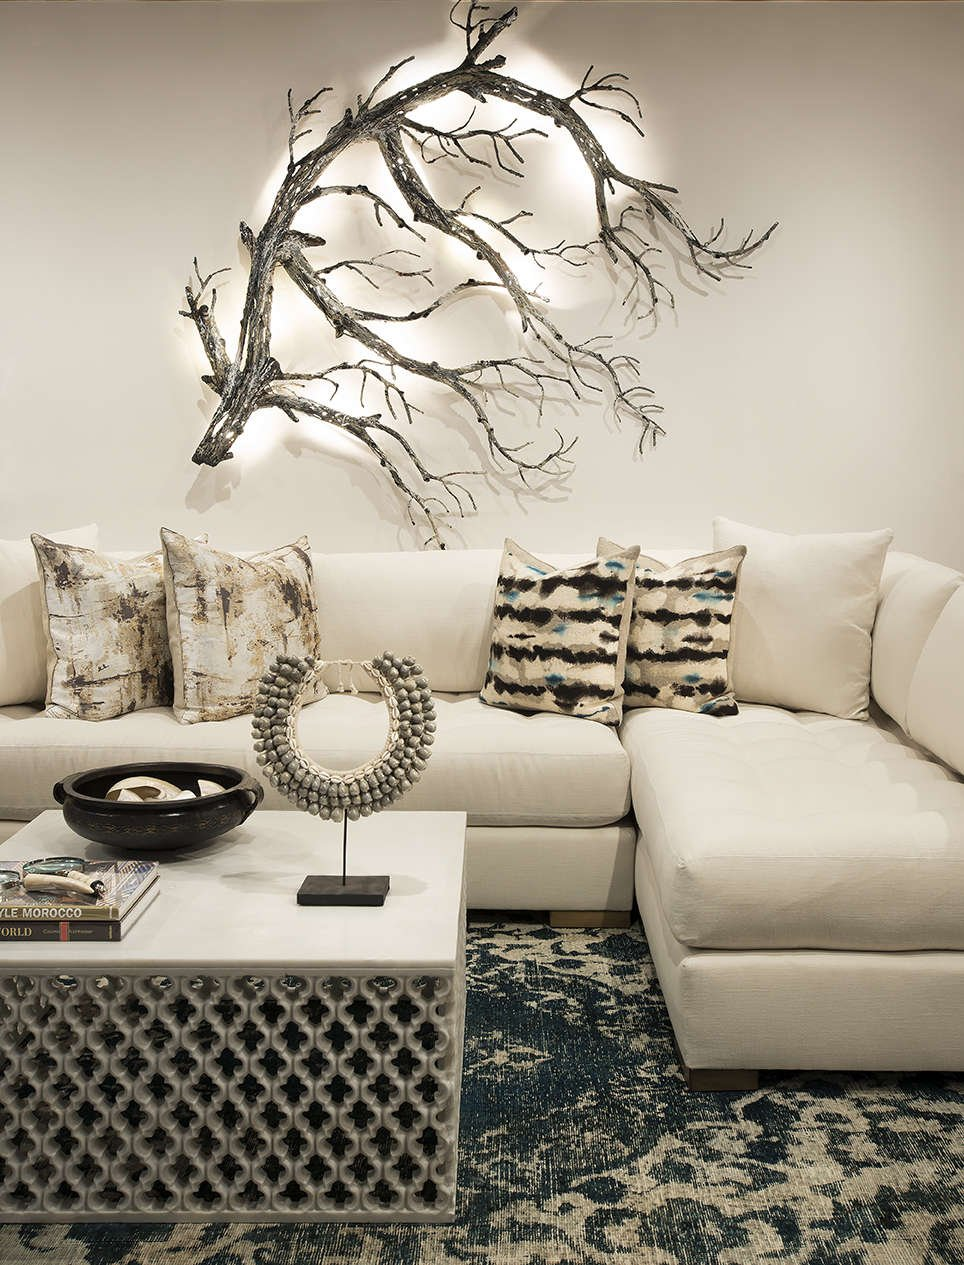 Mantra Furnishings established 2017